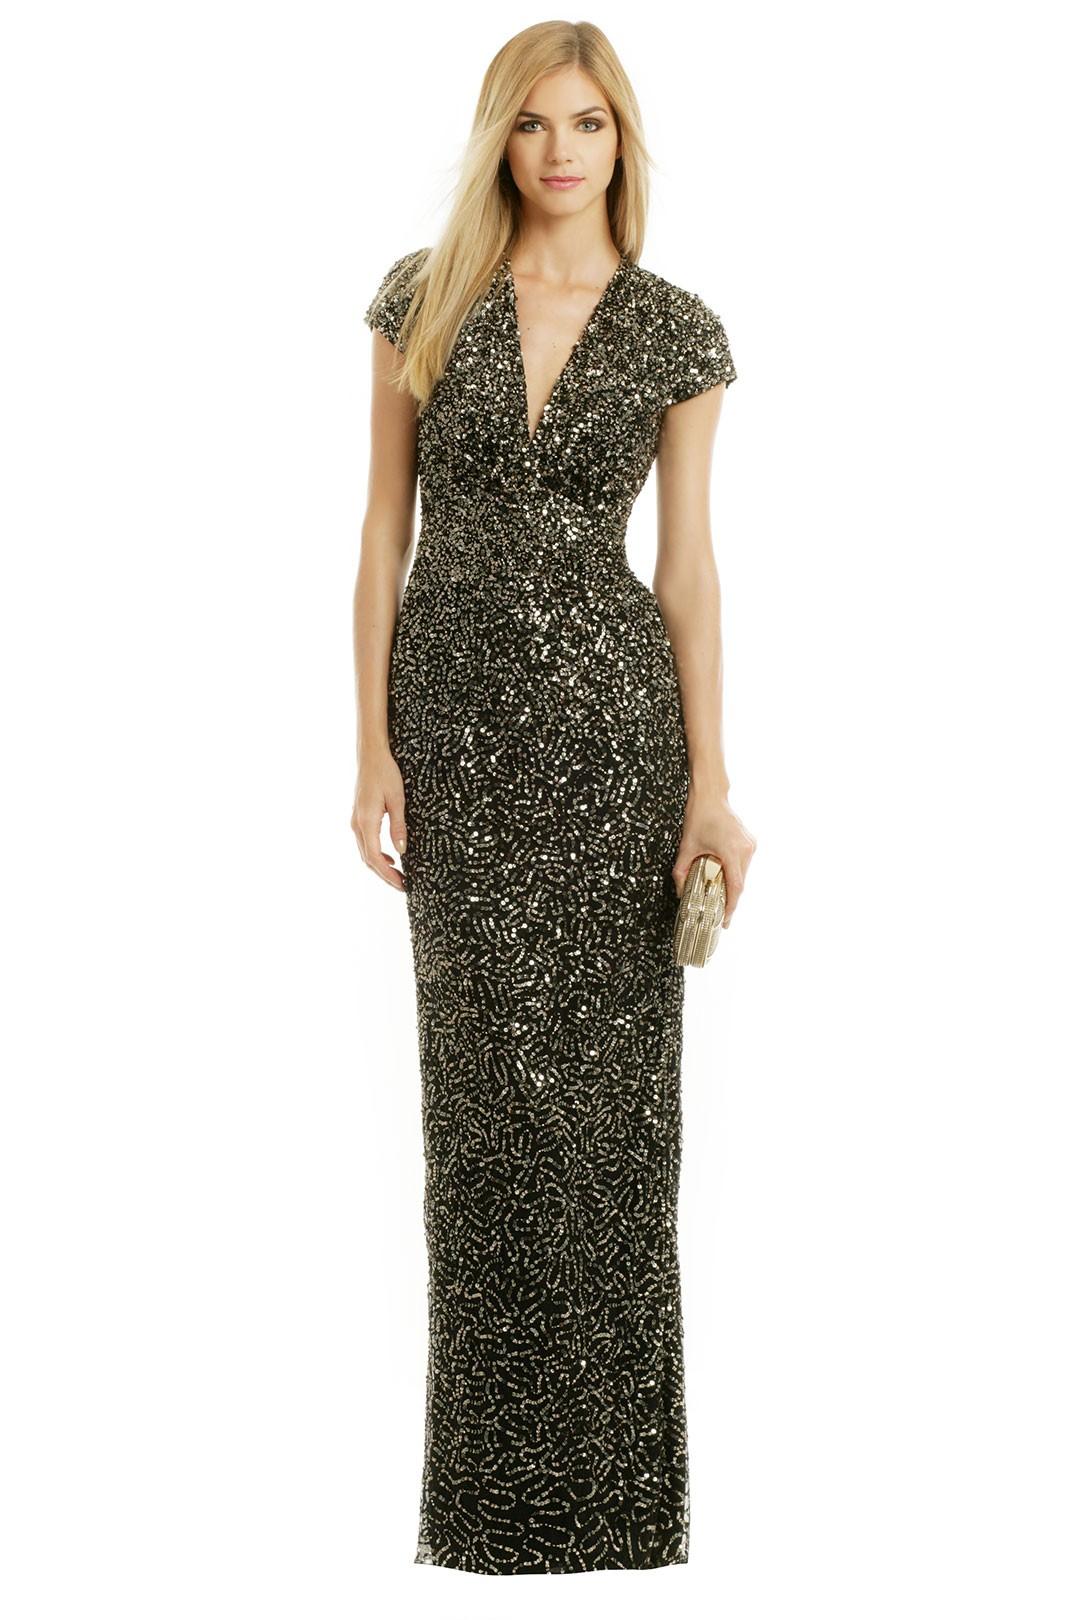 Nicole Miller Long Dresses